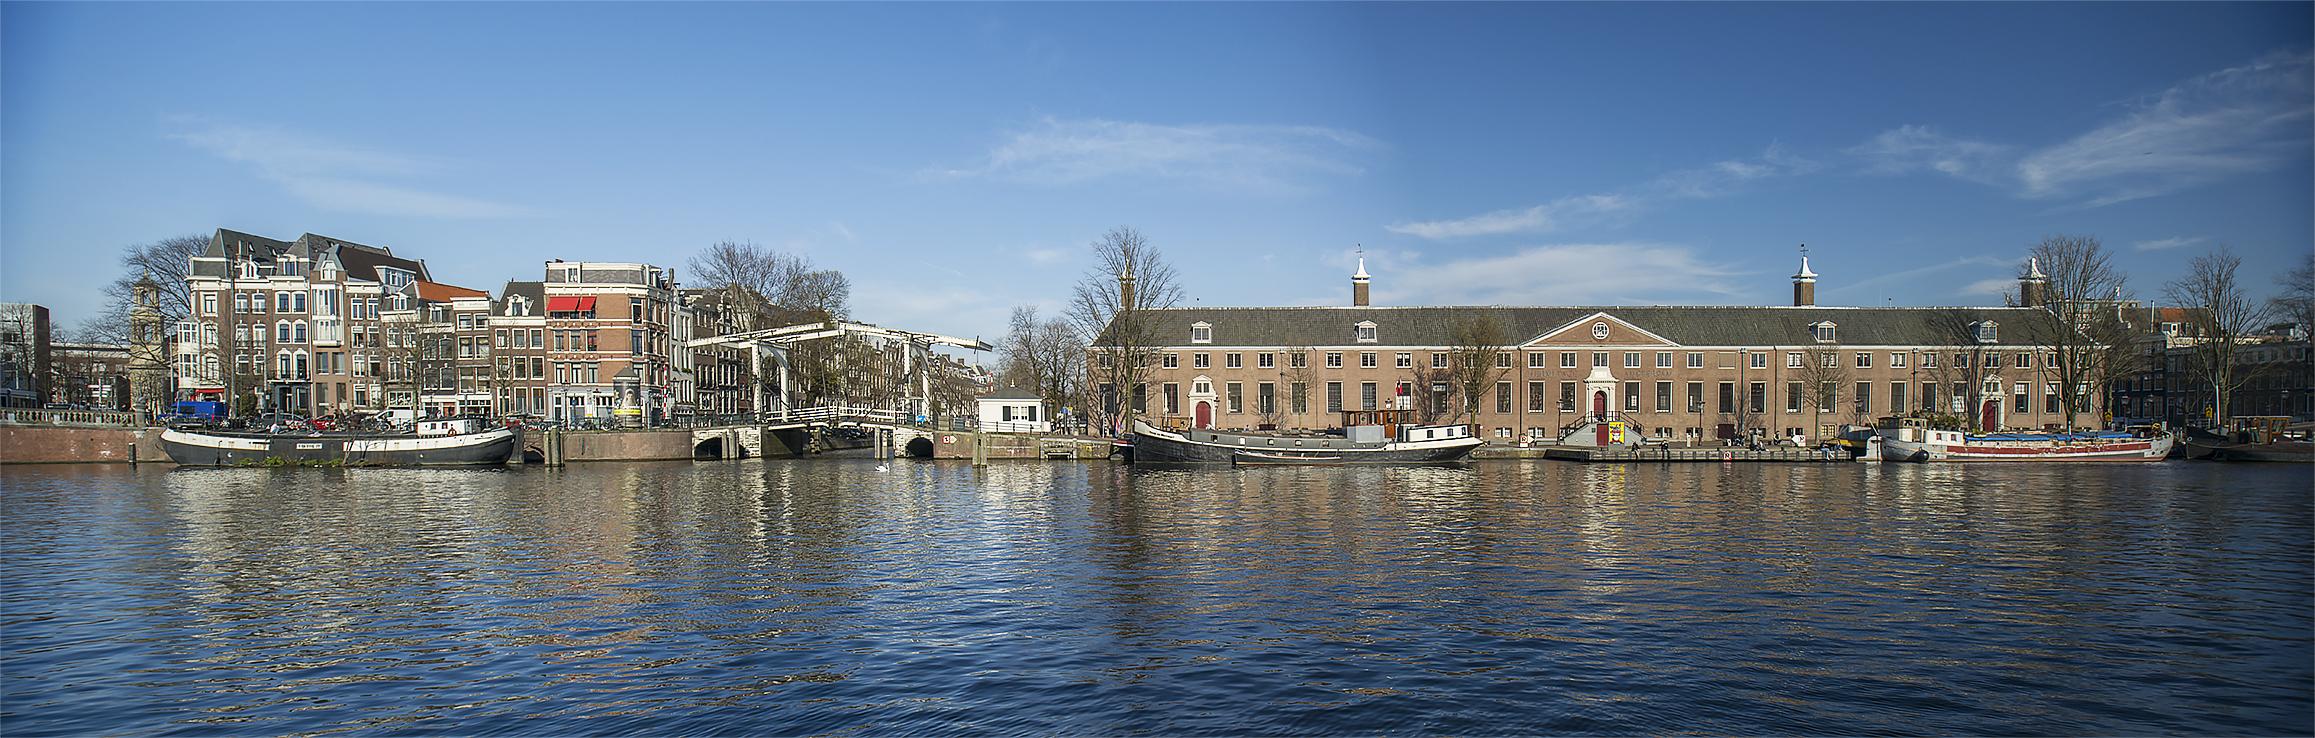 Hermitage Amsterdam | Monumenten fotograaf Leontine van Geffen-Lamers